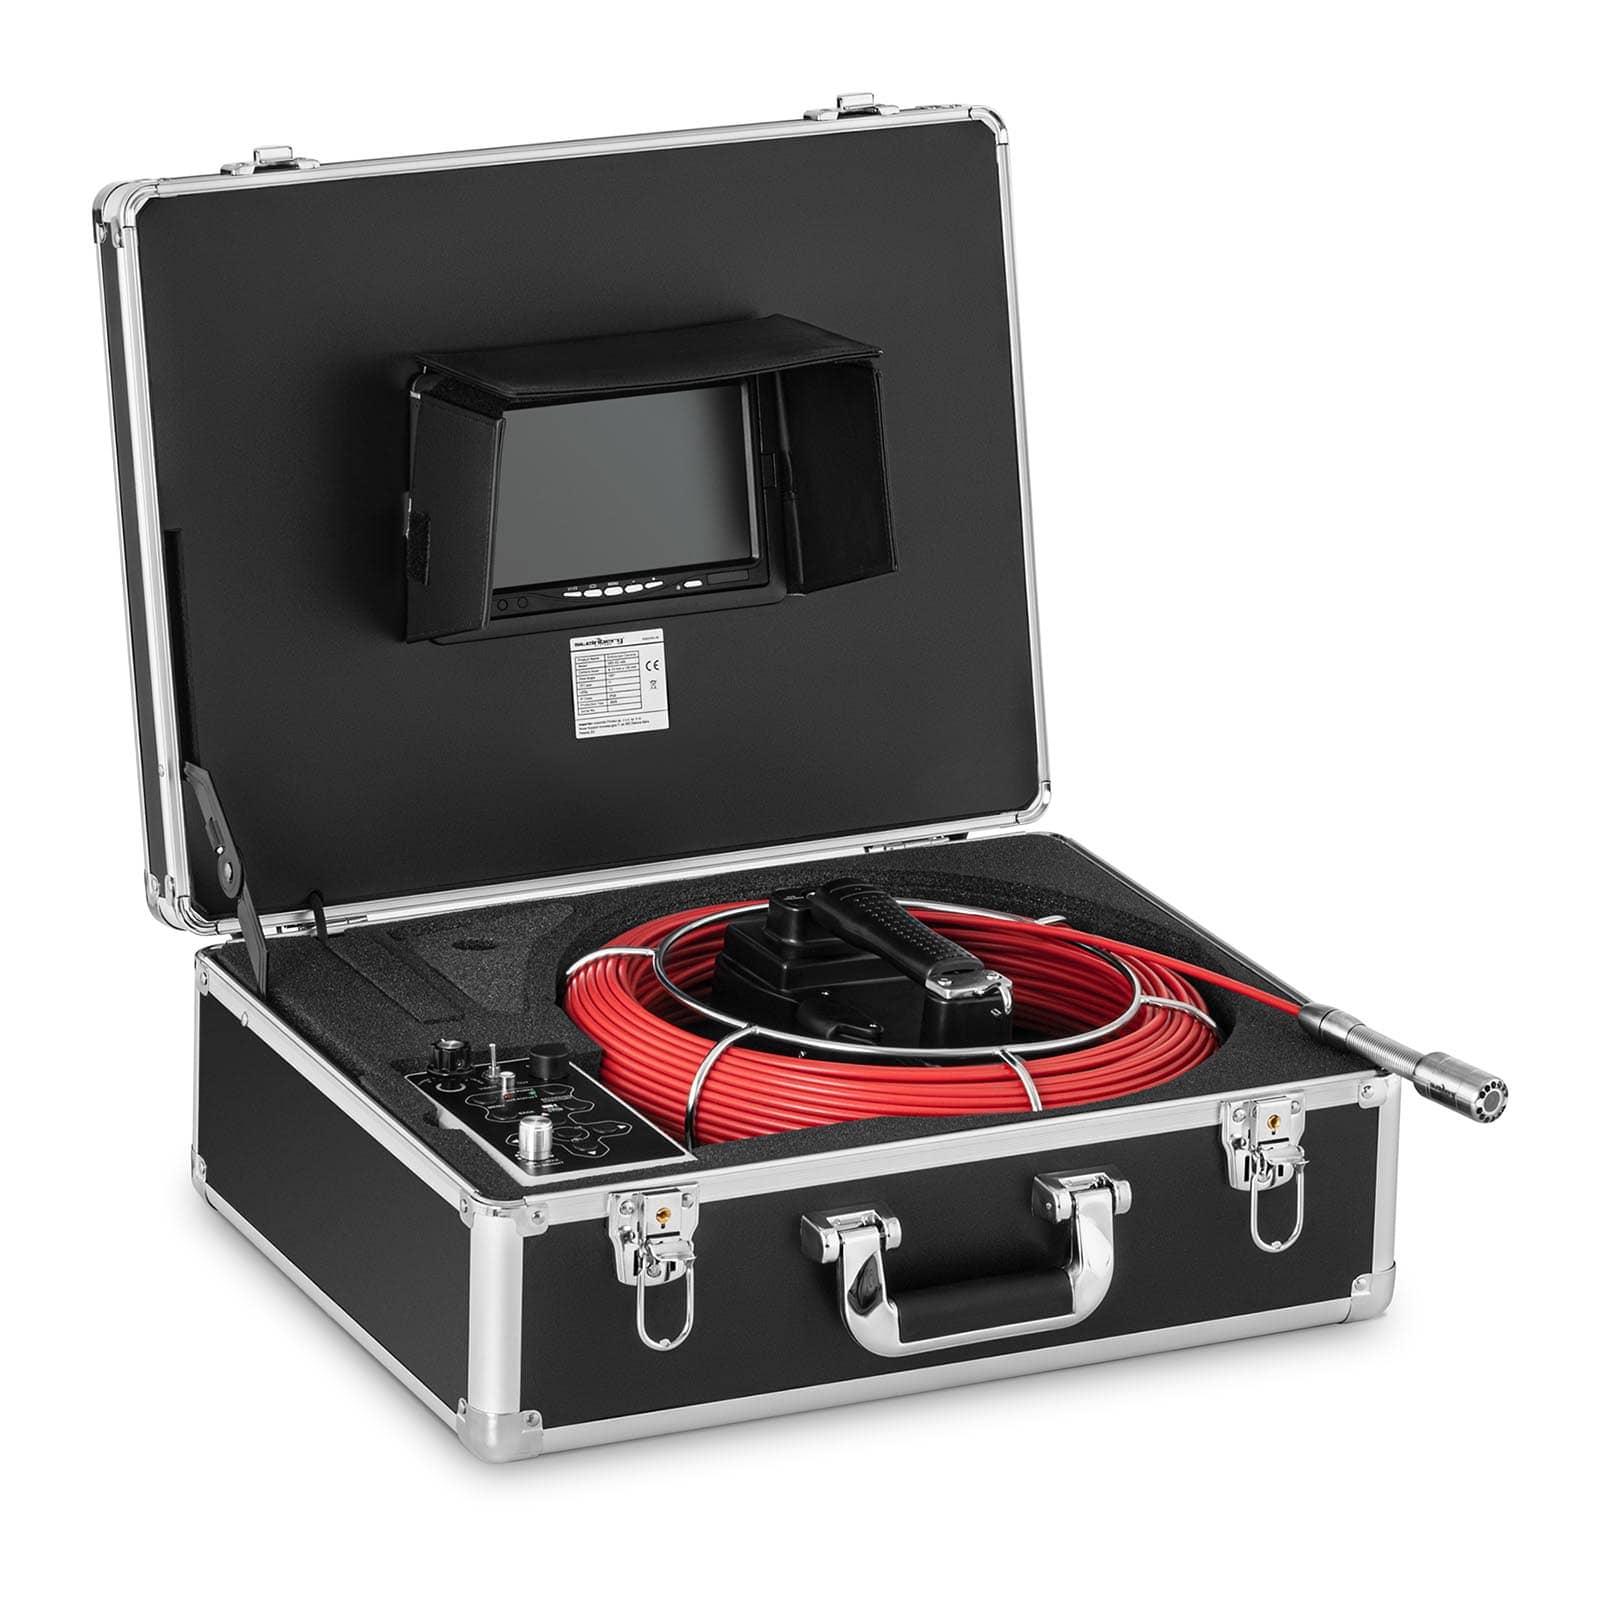 Endoscopes inspection cameras